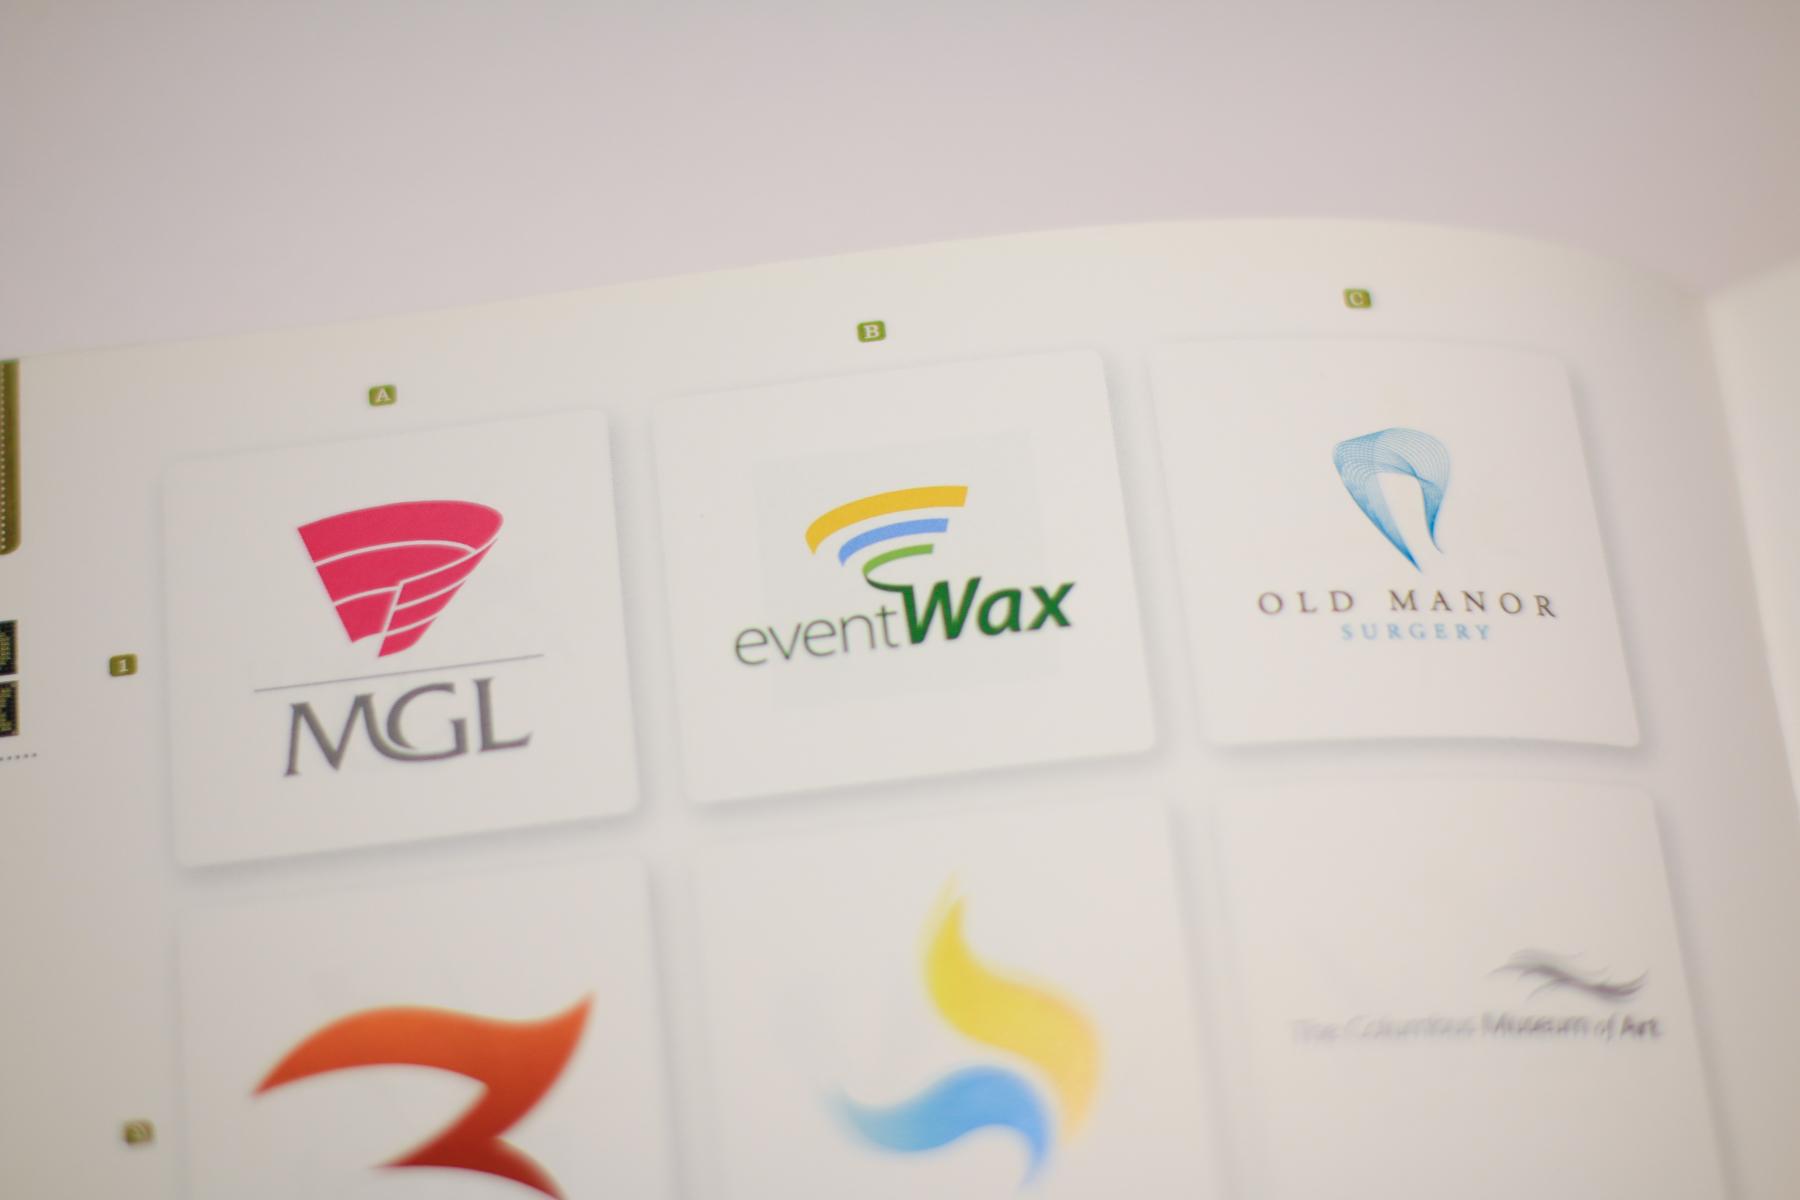 LogoLounge Master Library Series